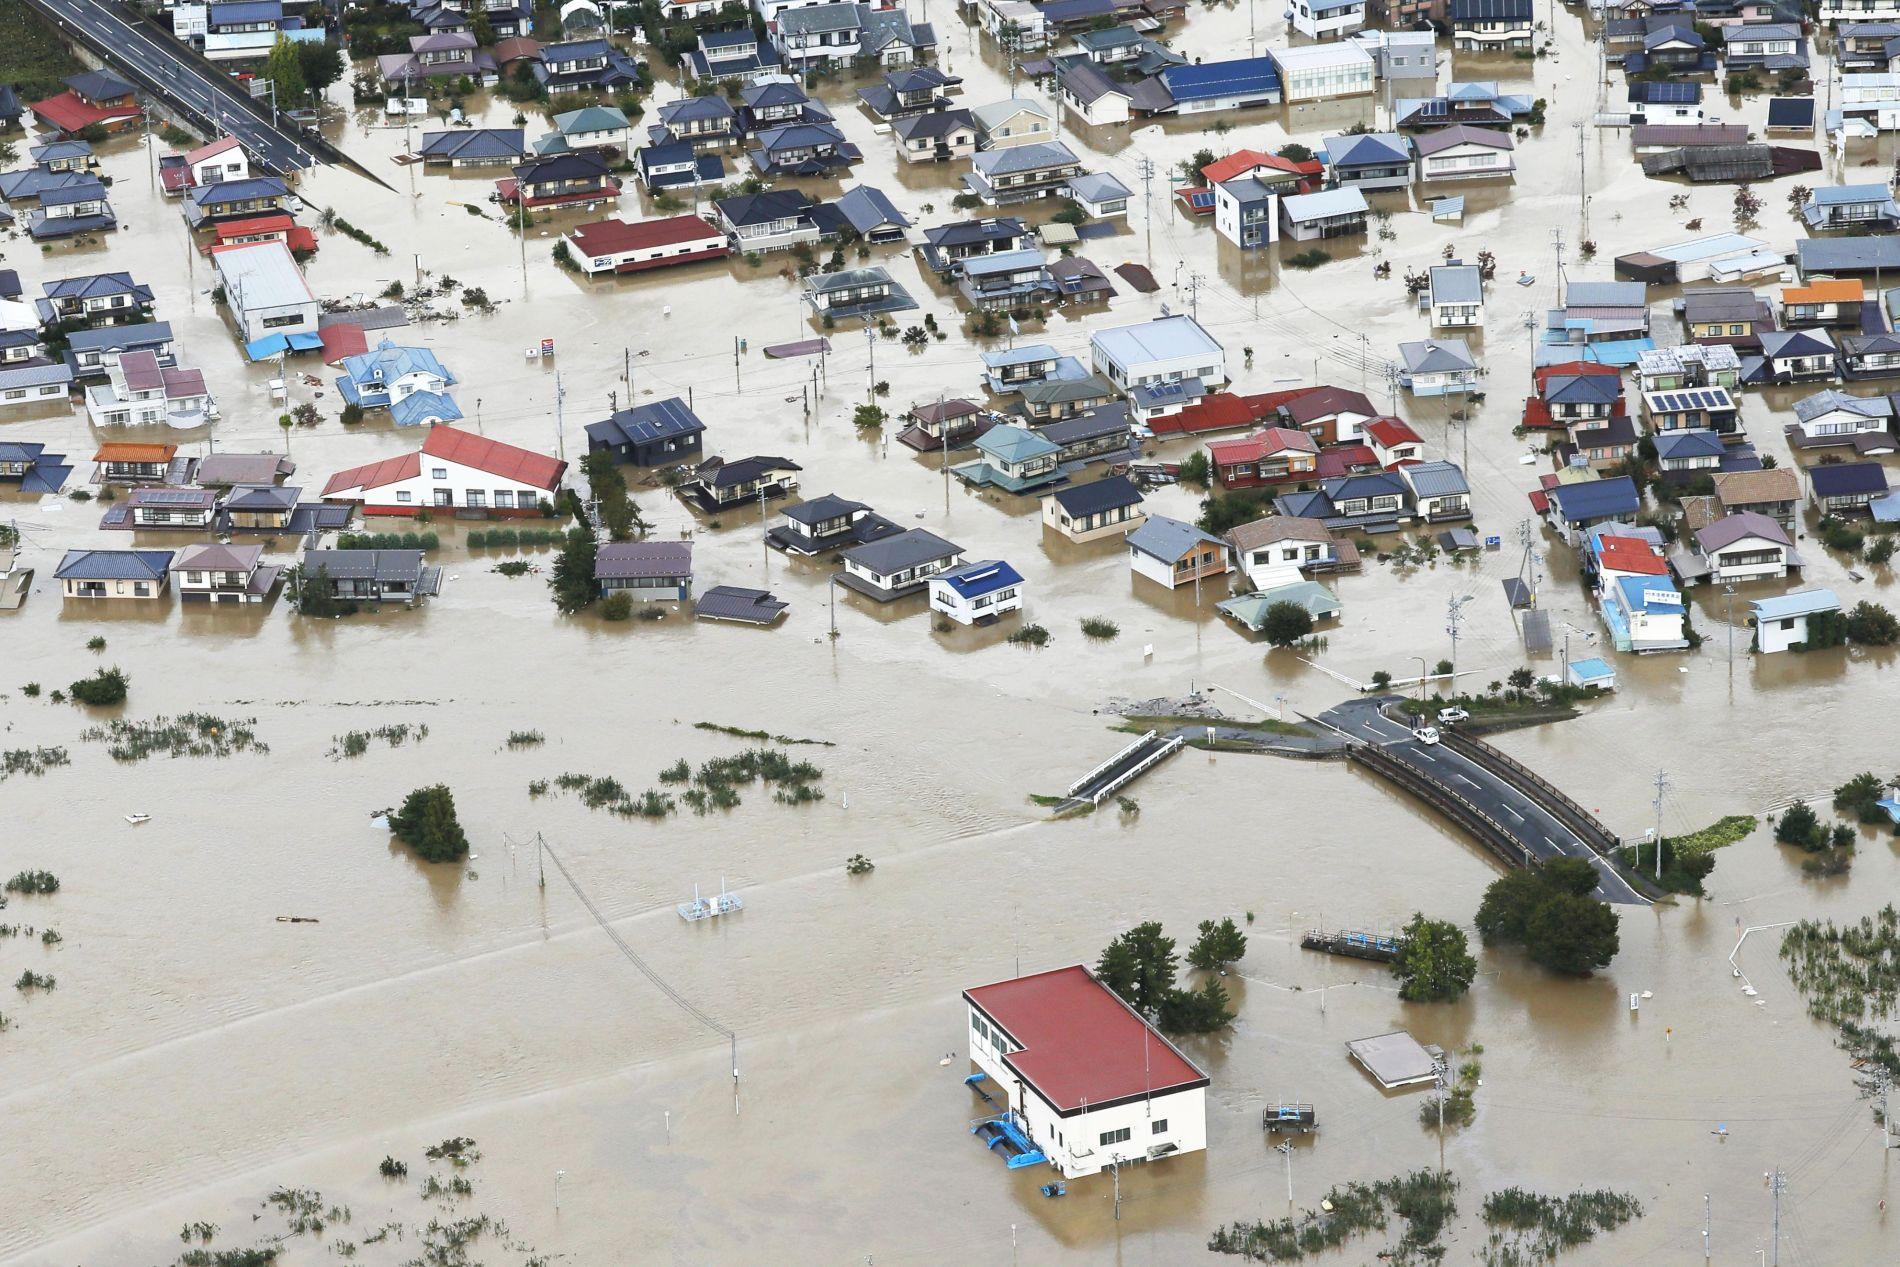 Aftermath of Super Typhoon Hagibis in Japan 024